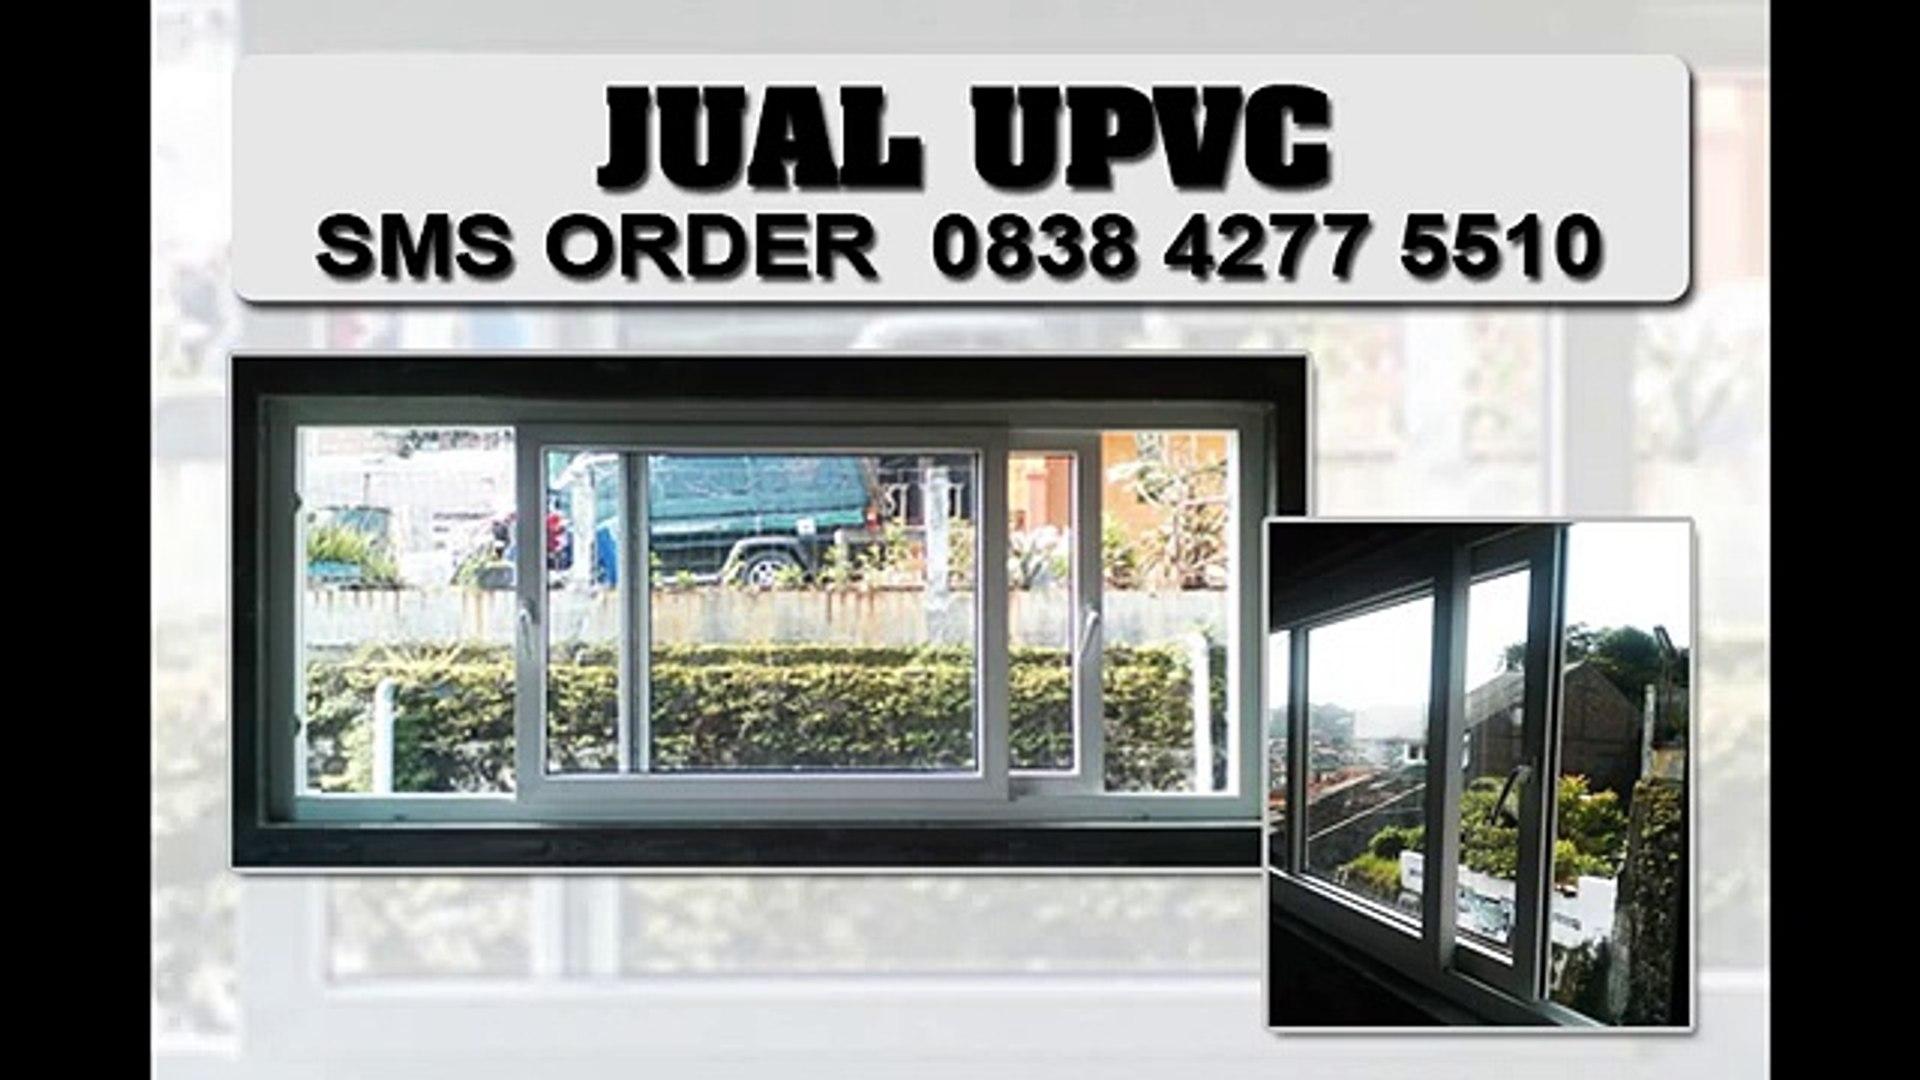 Upvc Semarang 0838 4277 5510 Pintu Jendela Kusen Upvc Semarang Video Dailymotion